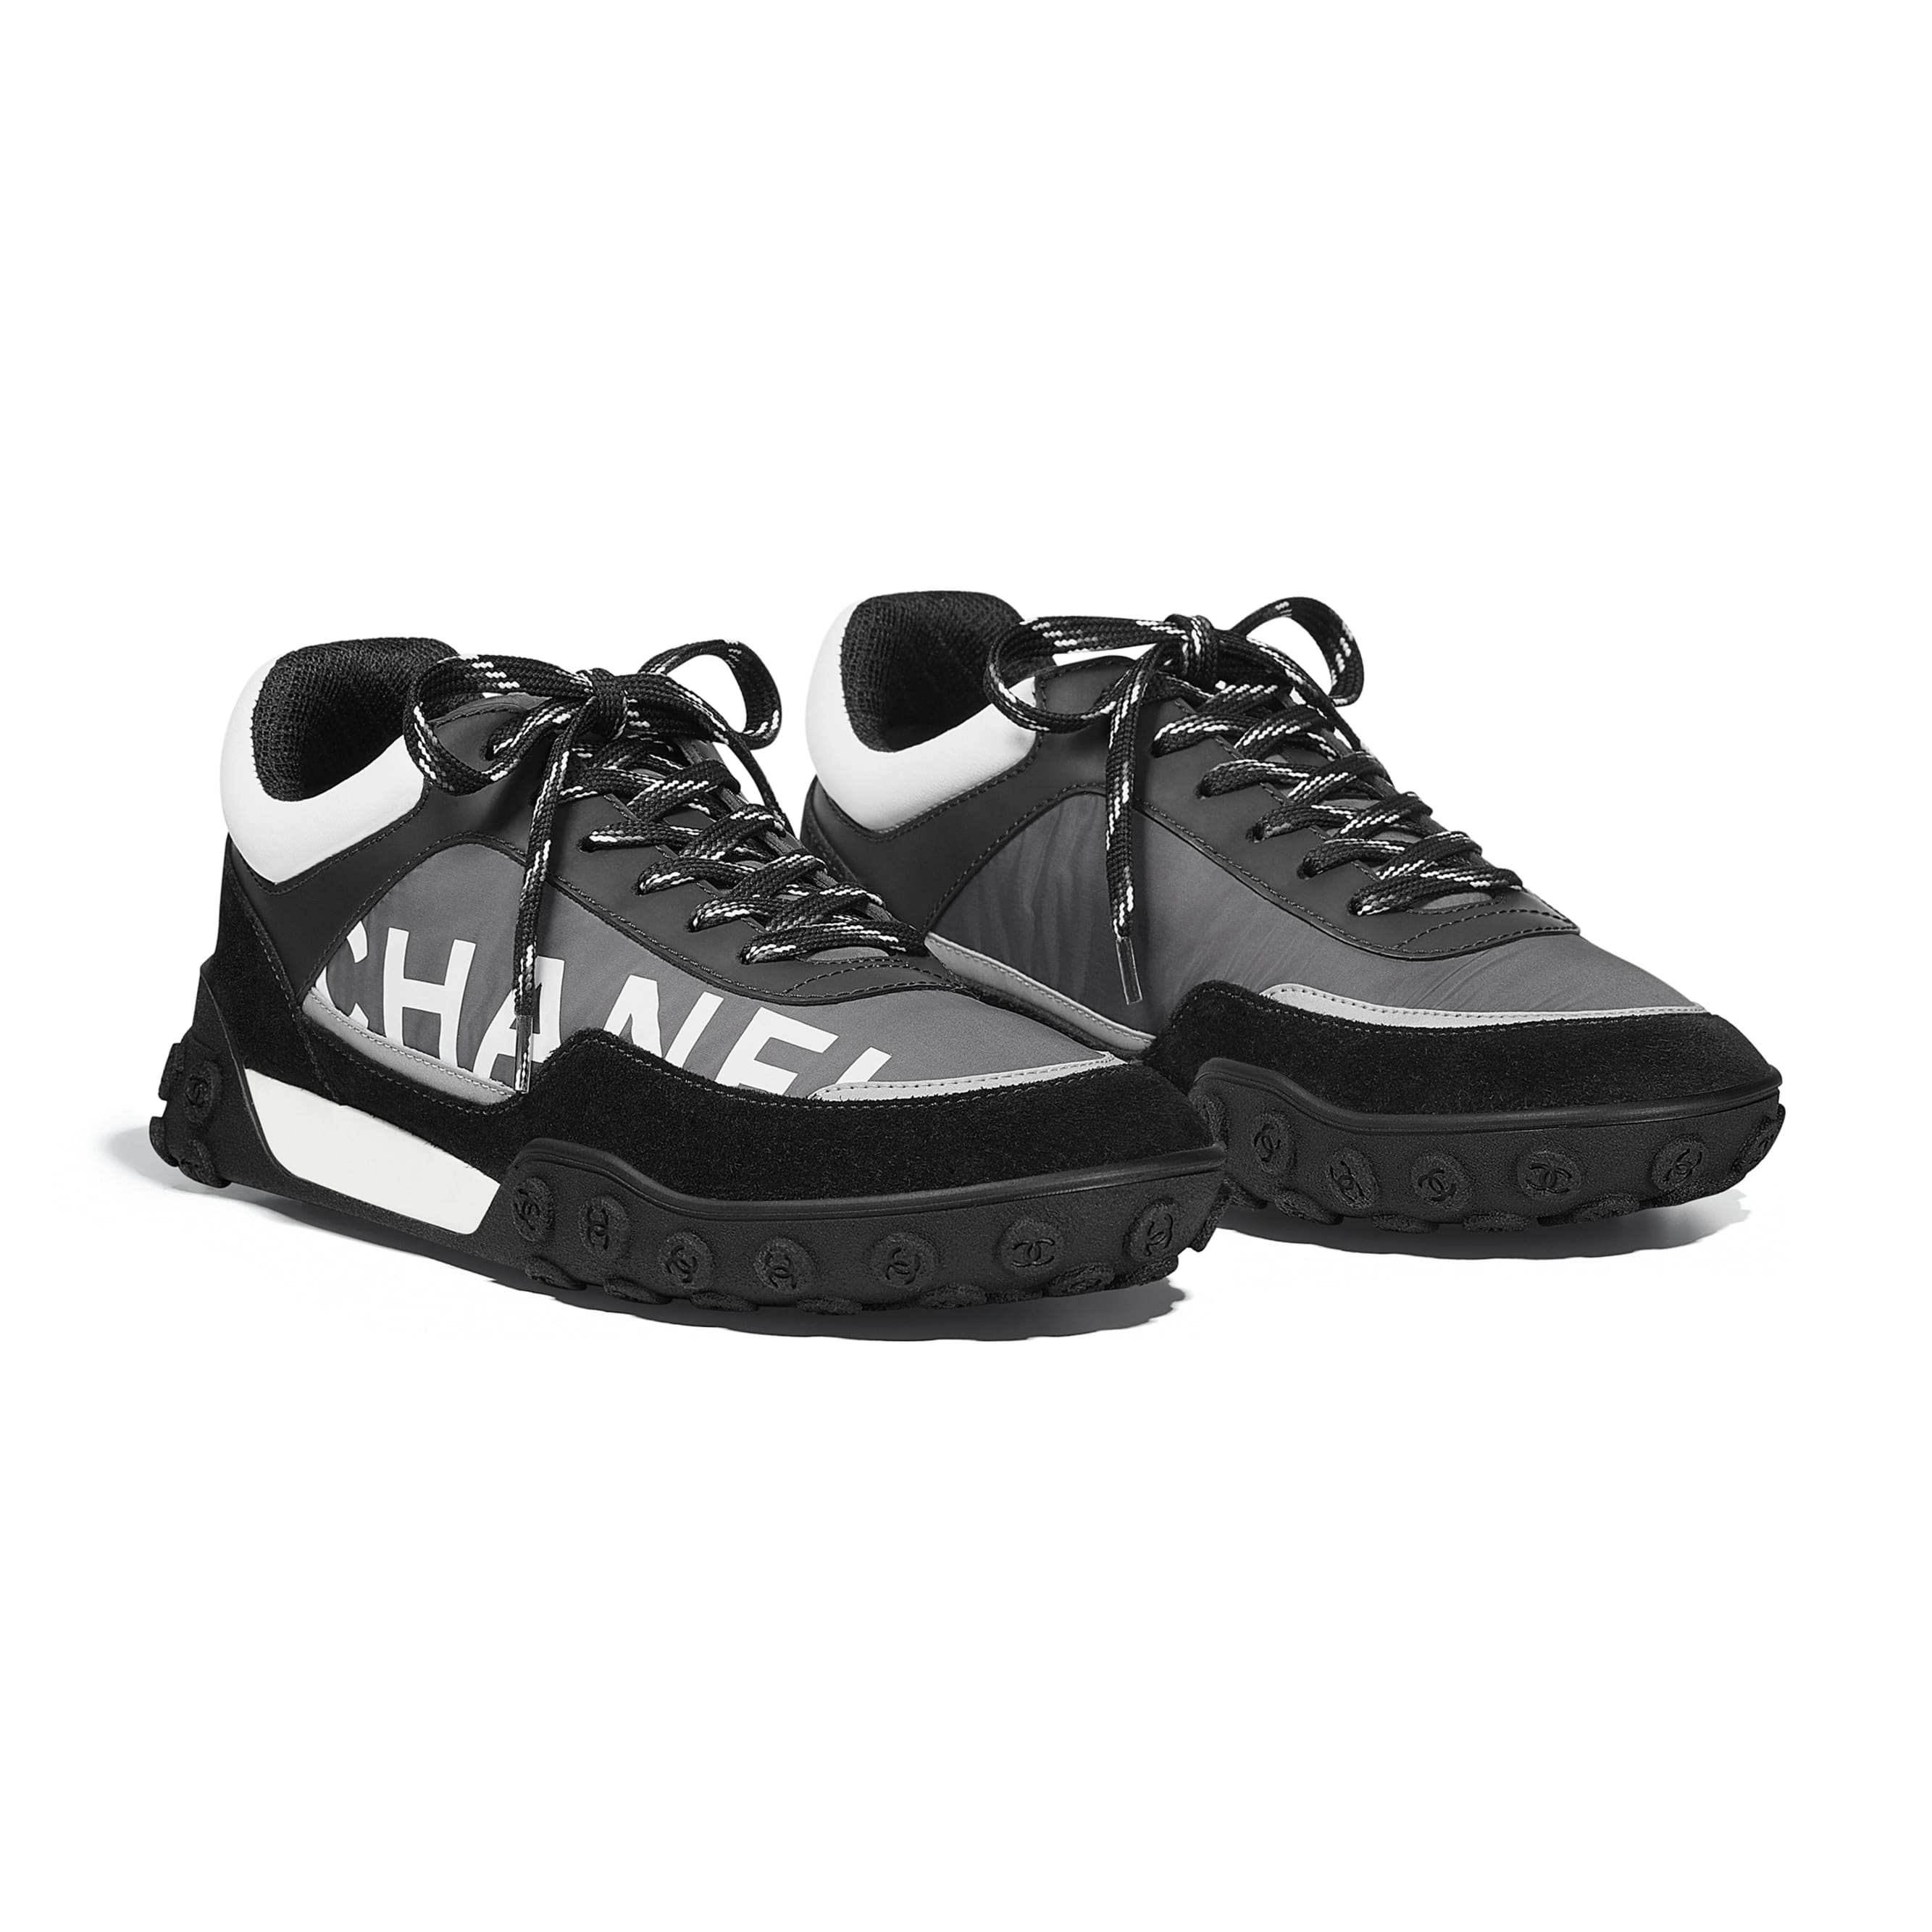 Sneakers - Gray, Black & White - Nylon & Calfskin - Alternative view - see standard sized version